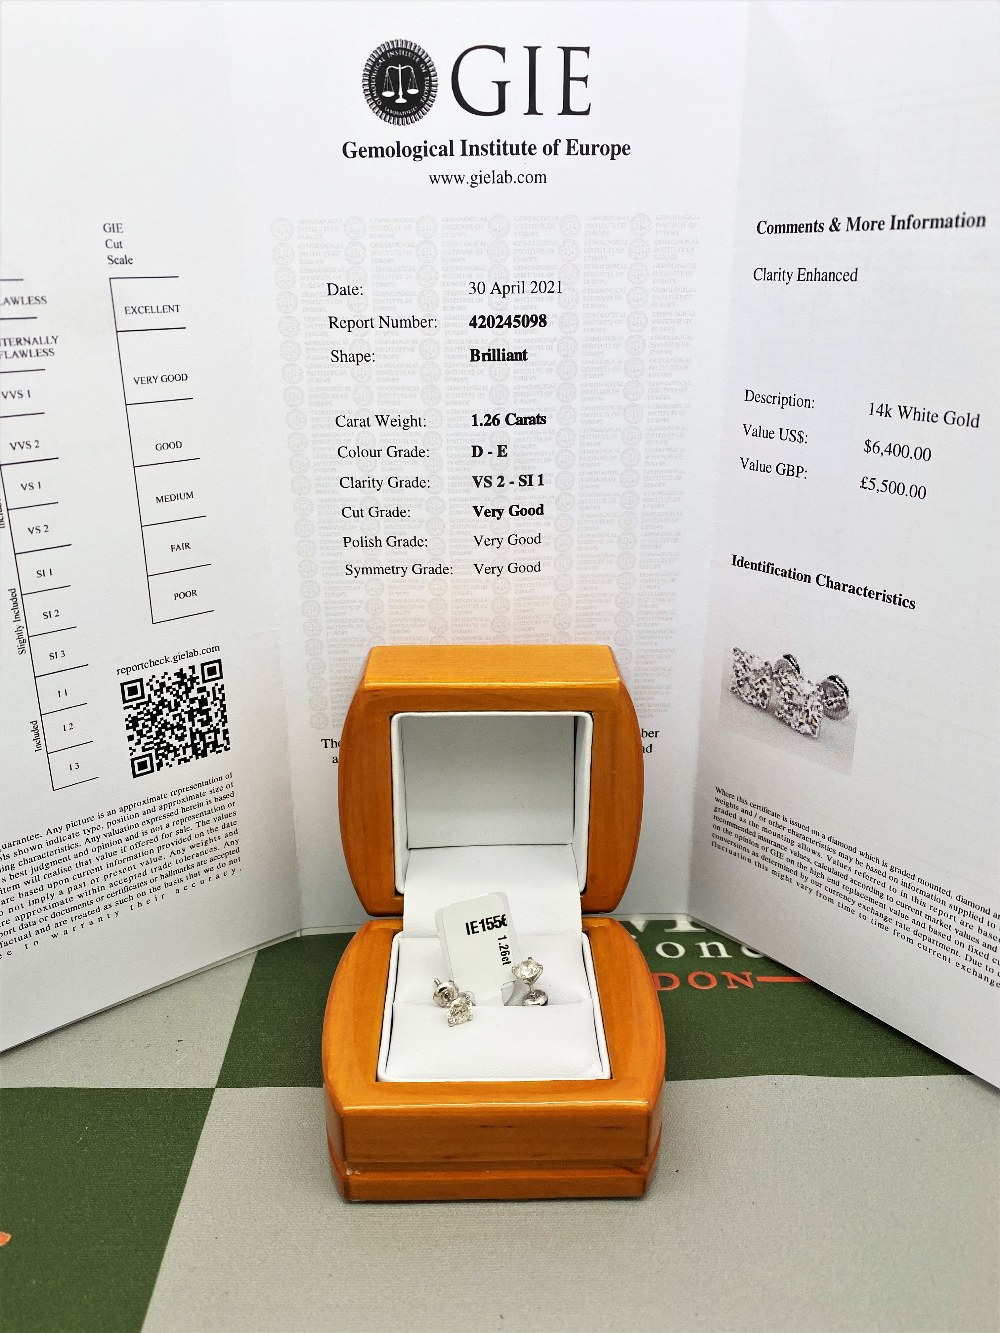 Pair of New 1.36 Carat Round Cut VS2/D Diamond Stud Earrings On 14K Hallmarked White Gold